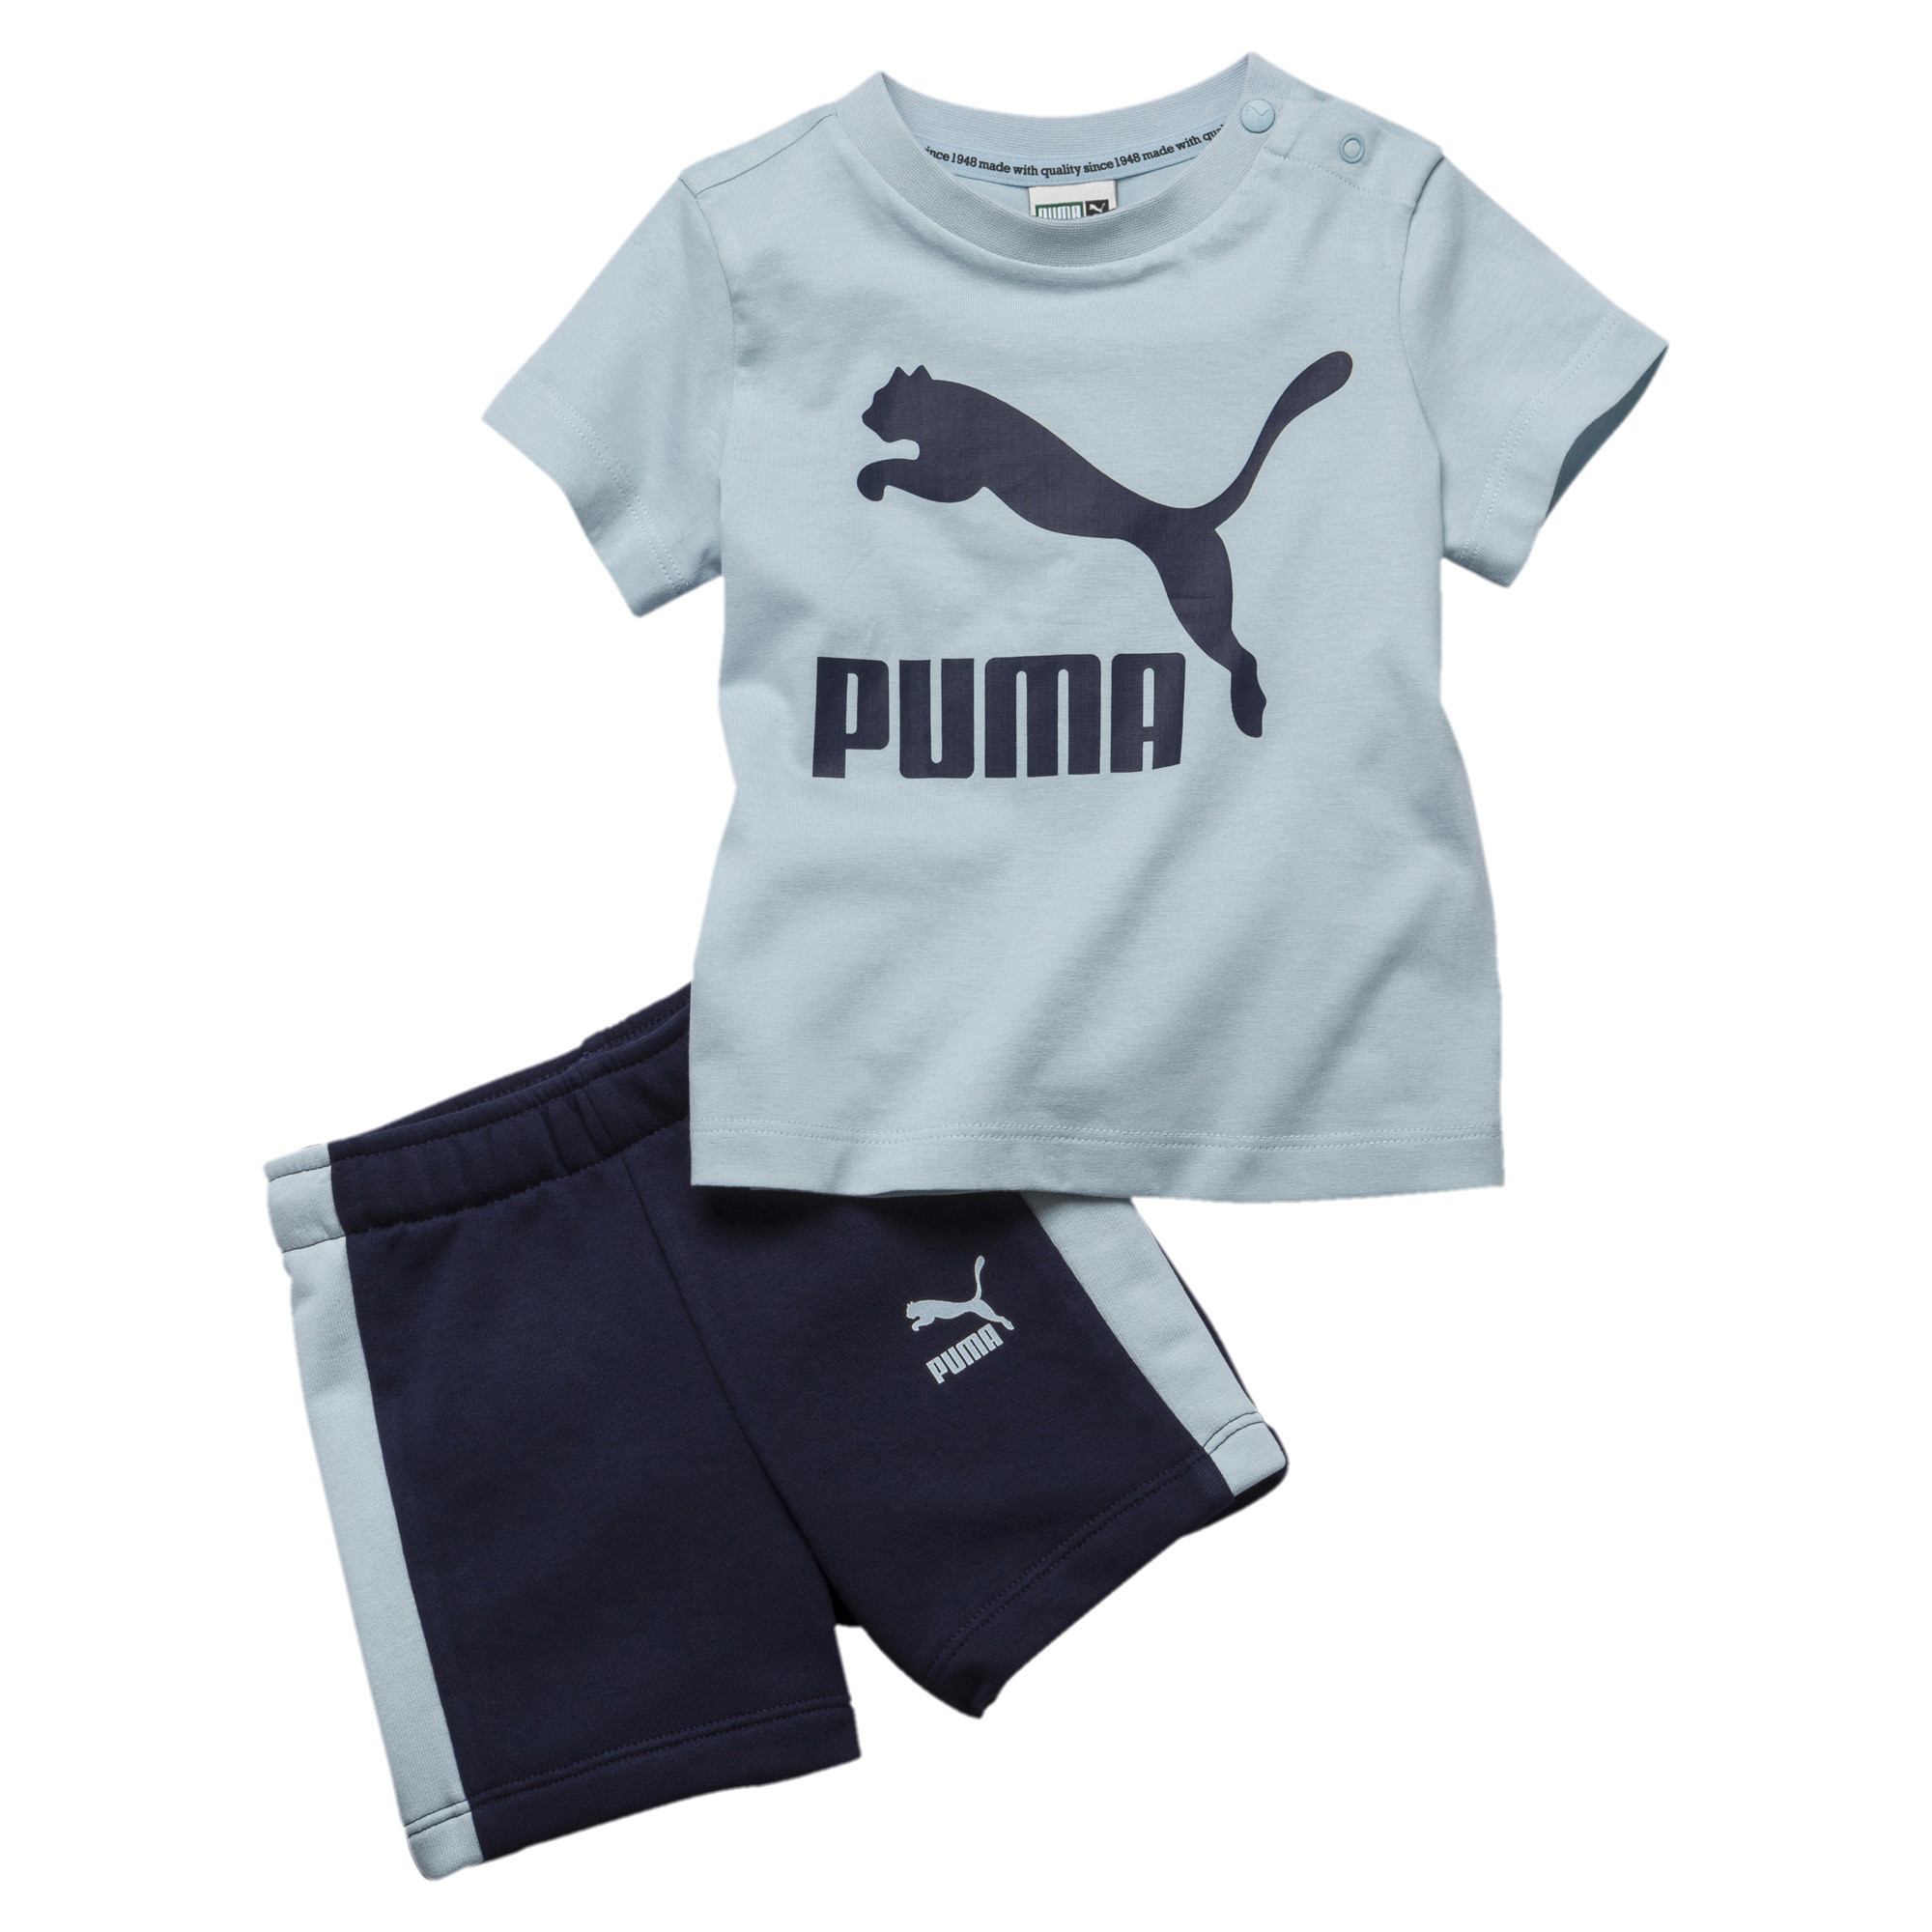 Image Puma Minicats T7 Baby Set #1